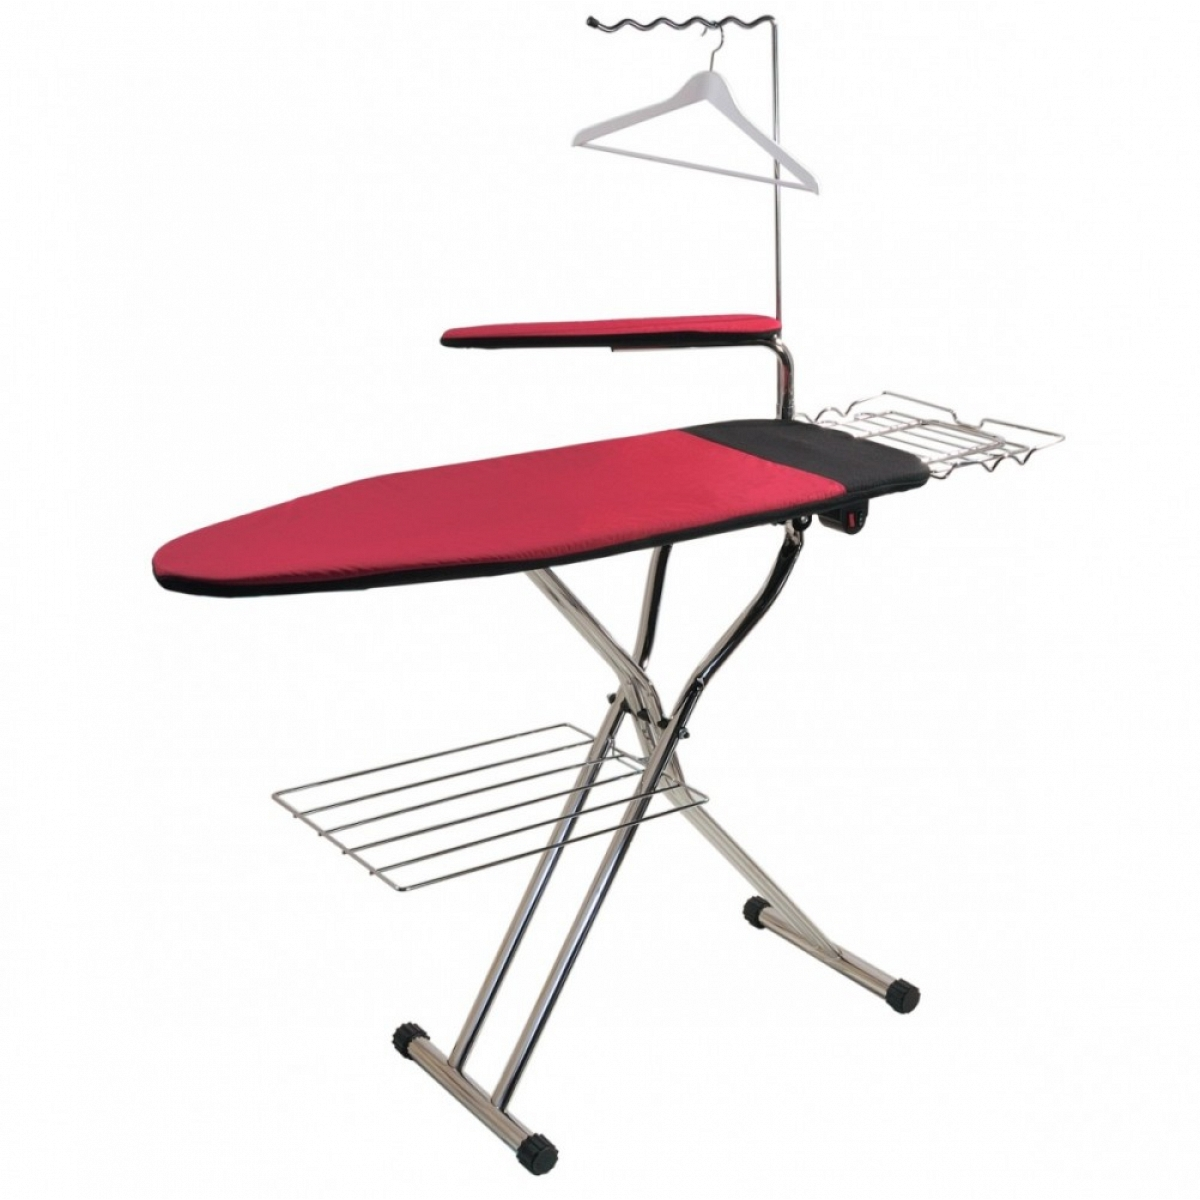 Heated Suction Blower Automatic Ironing Board Michelini